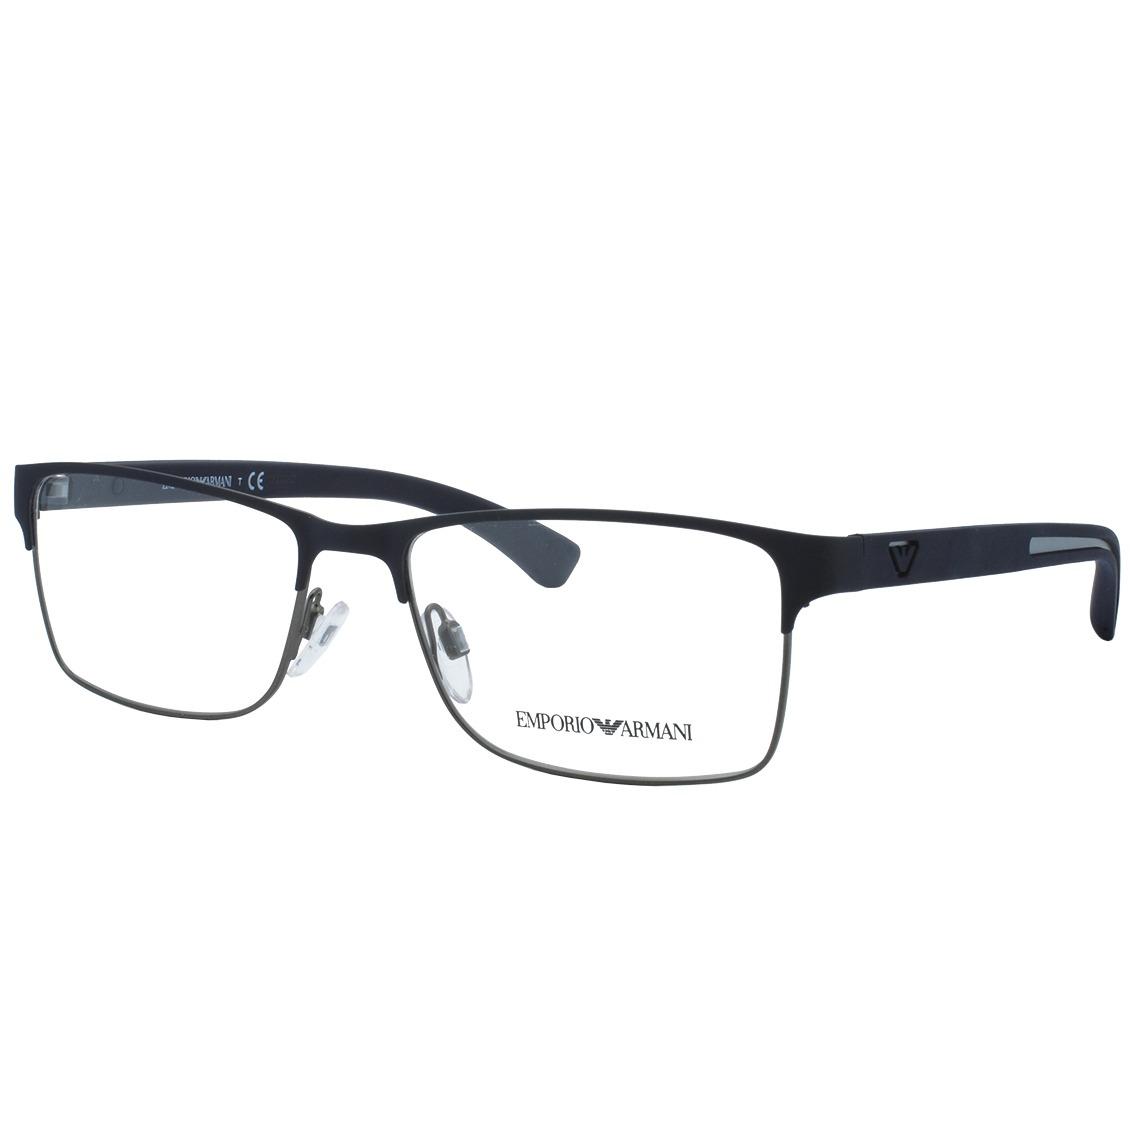 óculos de grau emporio armani masculino original ea1052 3155. Carregando  zoom. 8e0ba210fc